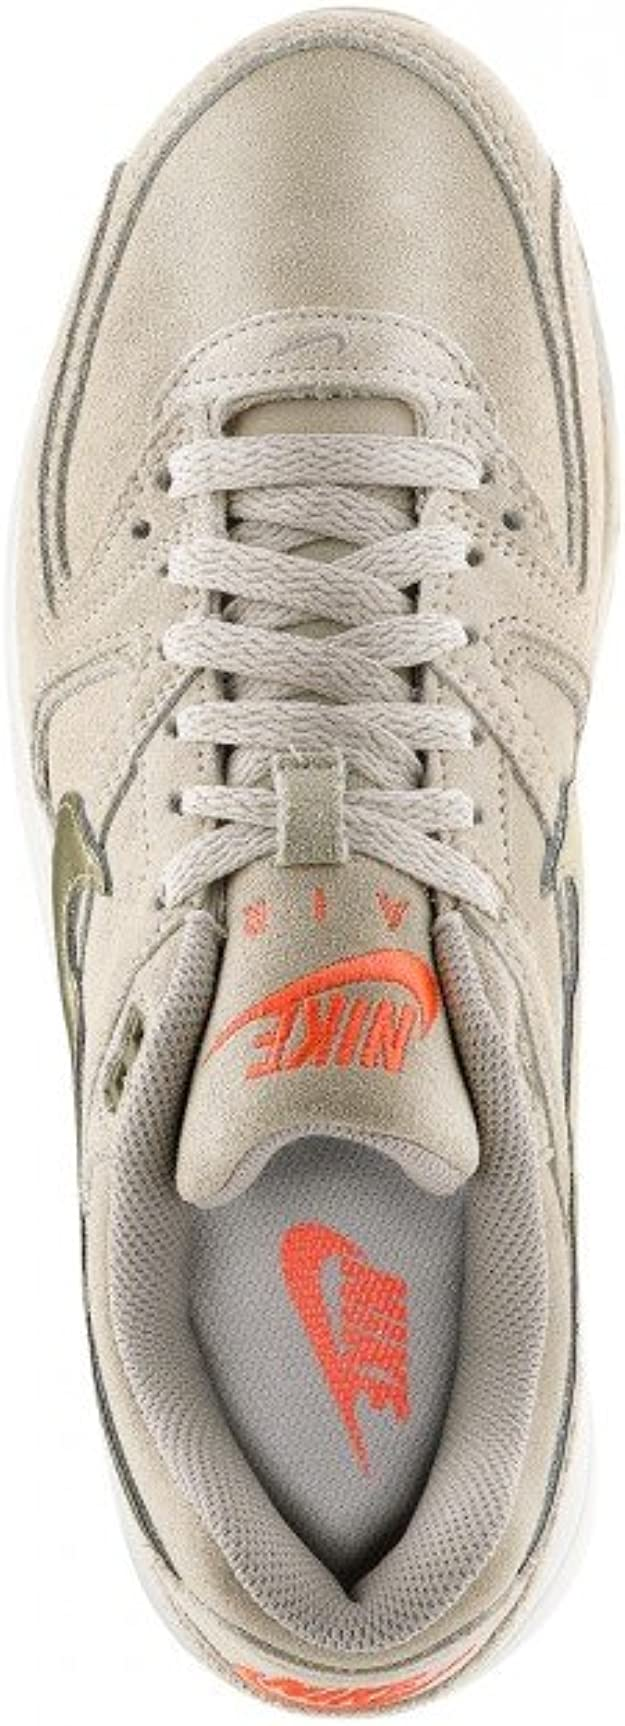 Nike Damen WMNS Air Max Command PRM Turnschuhe, Gris (String